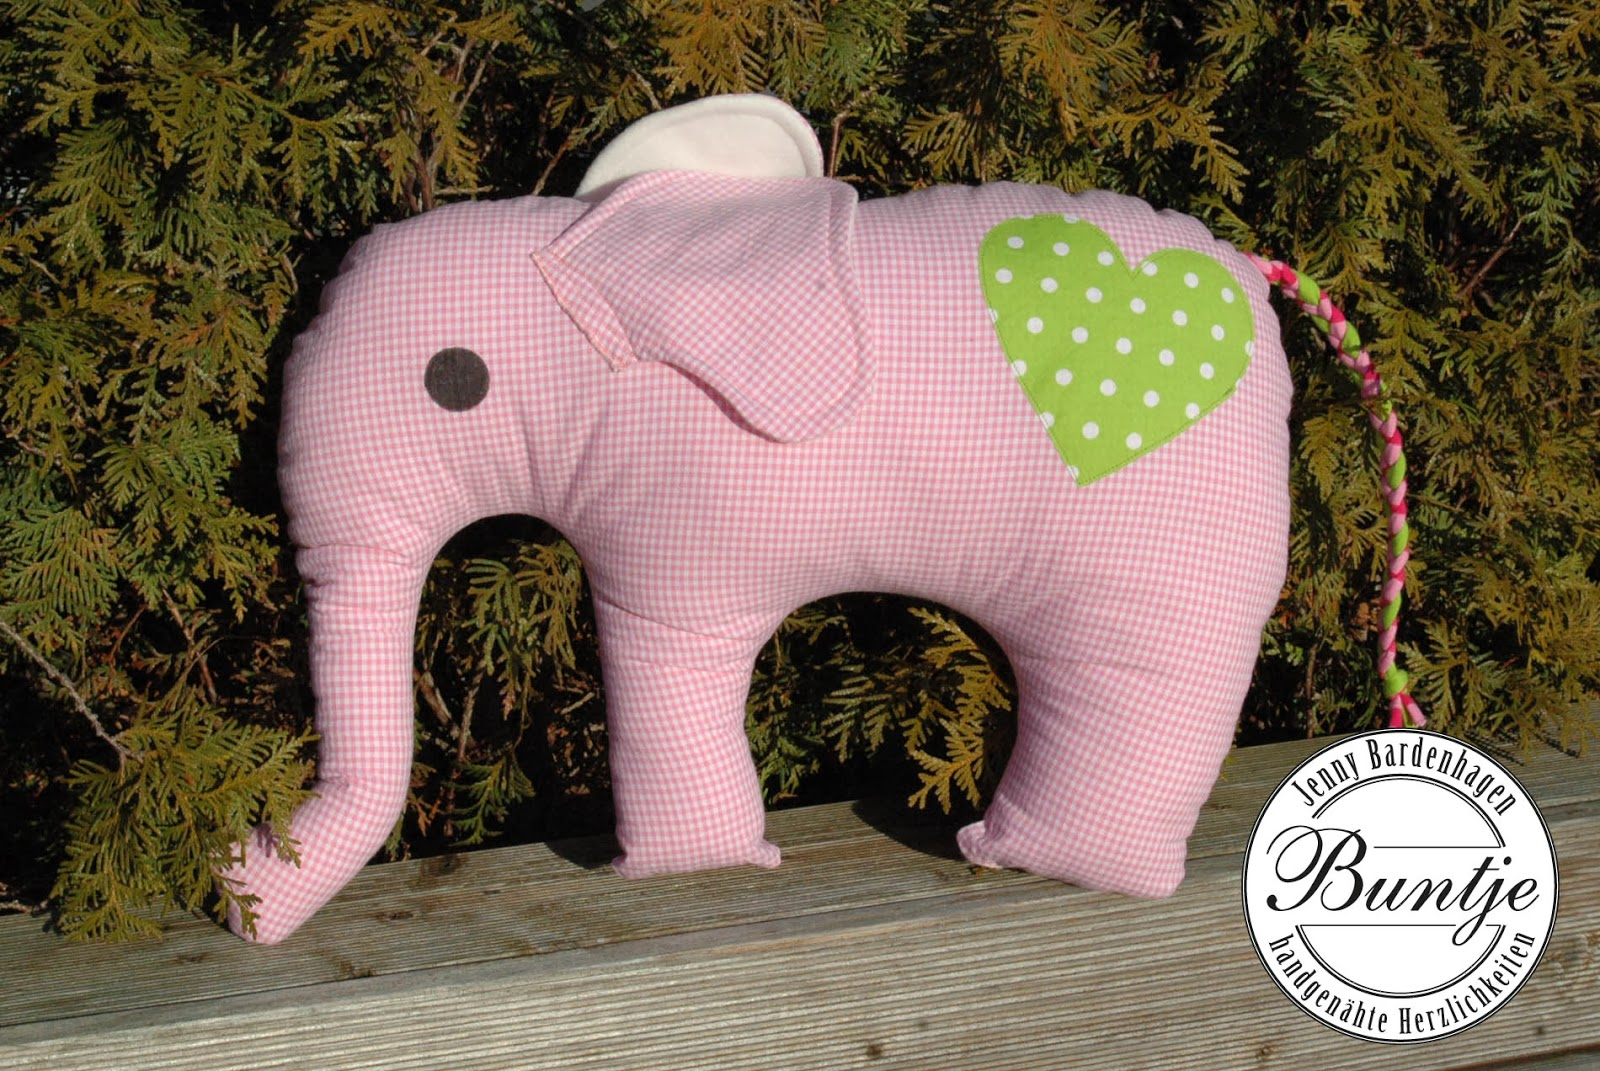 Kuscheltier Kuschel Elefant Geschenk Geburt Taufe Mädchen Baumwolle rosa grün individuell Farbenmix Elefantös nähen Buntje